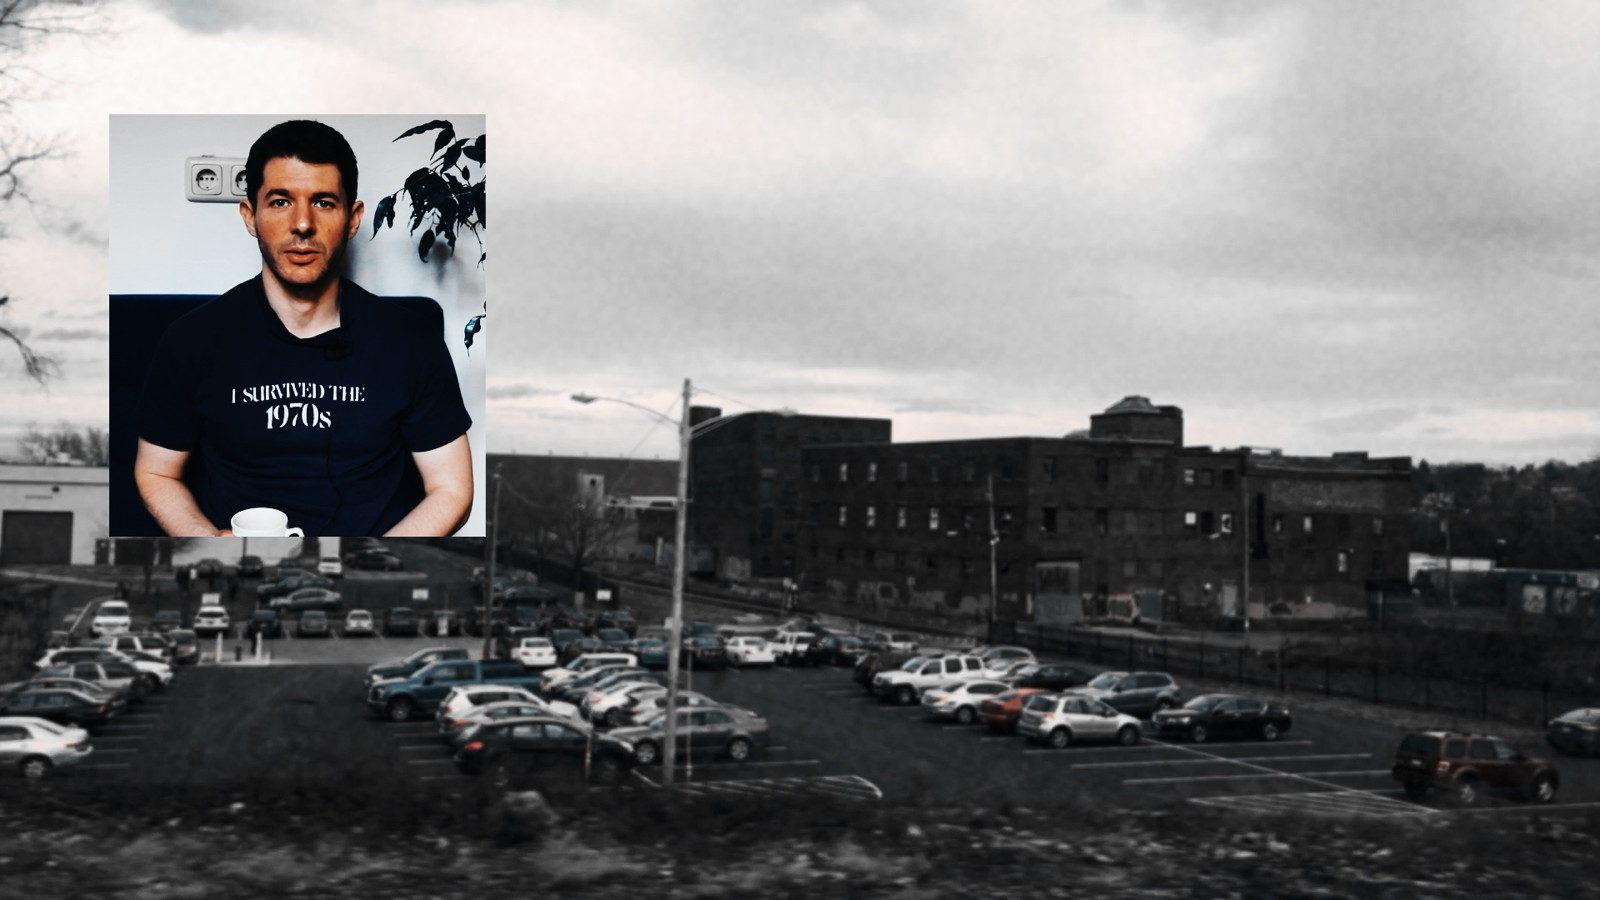 Jaakko Pallasvuo,  Filter , 2017, still from a video.